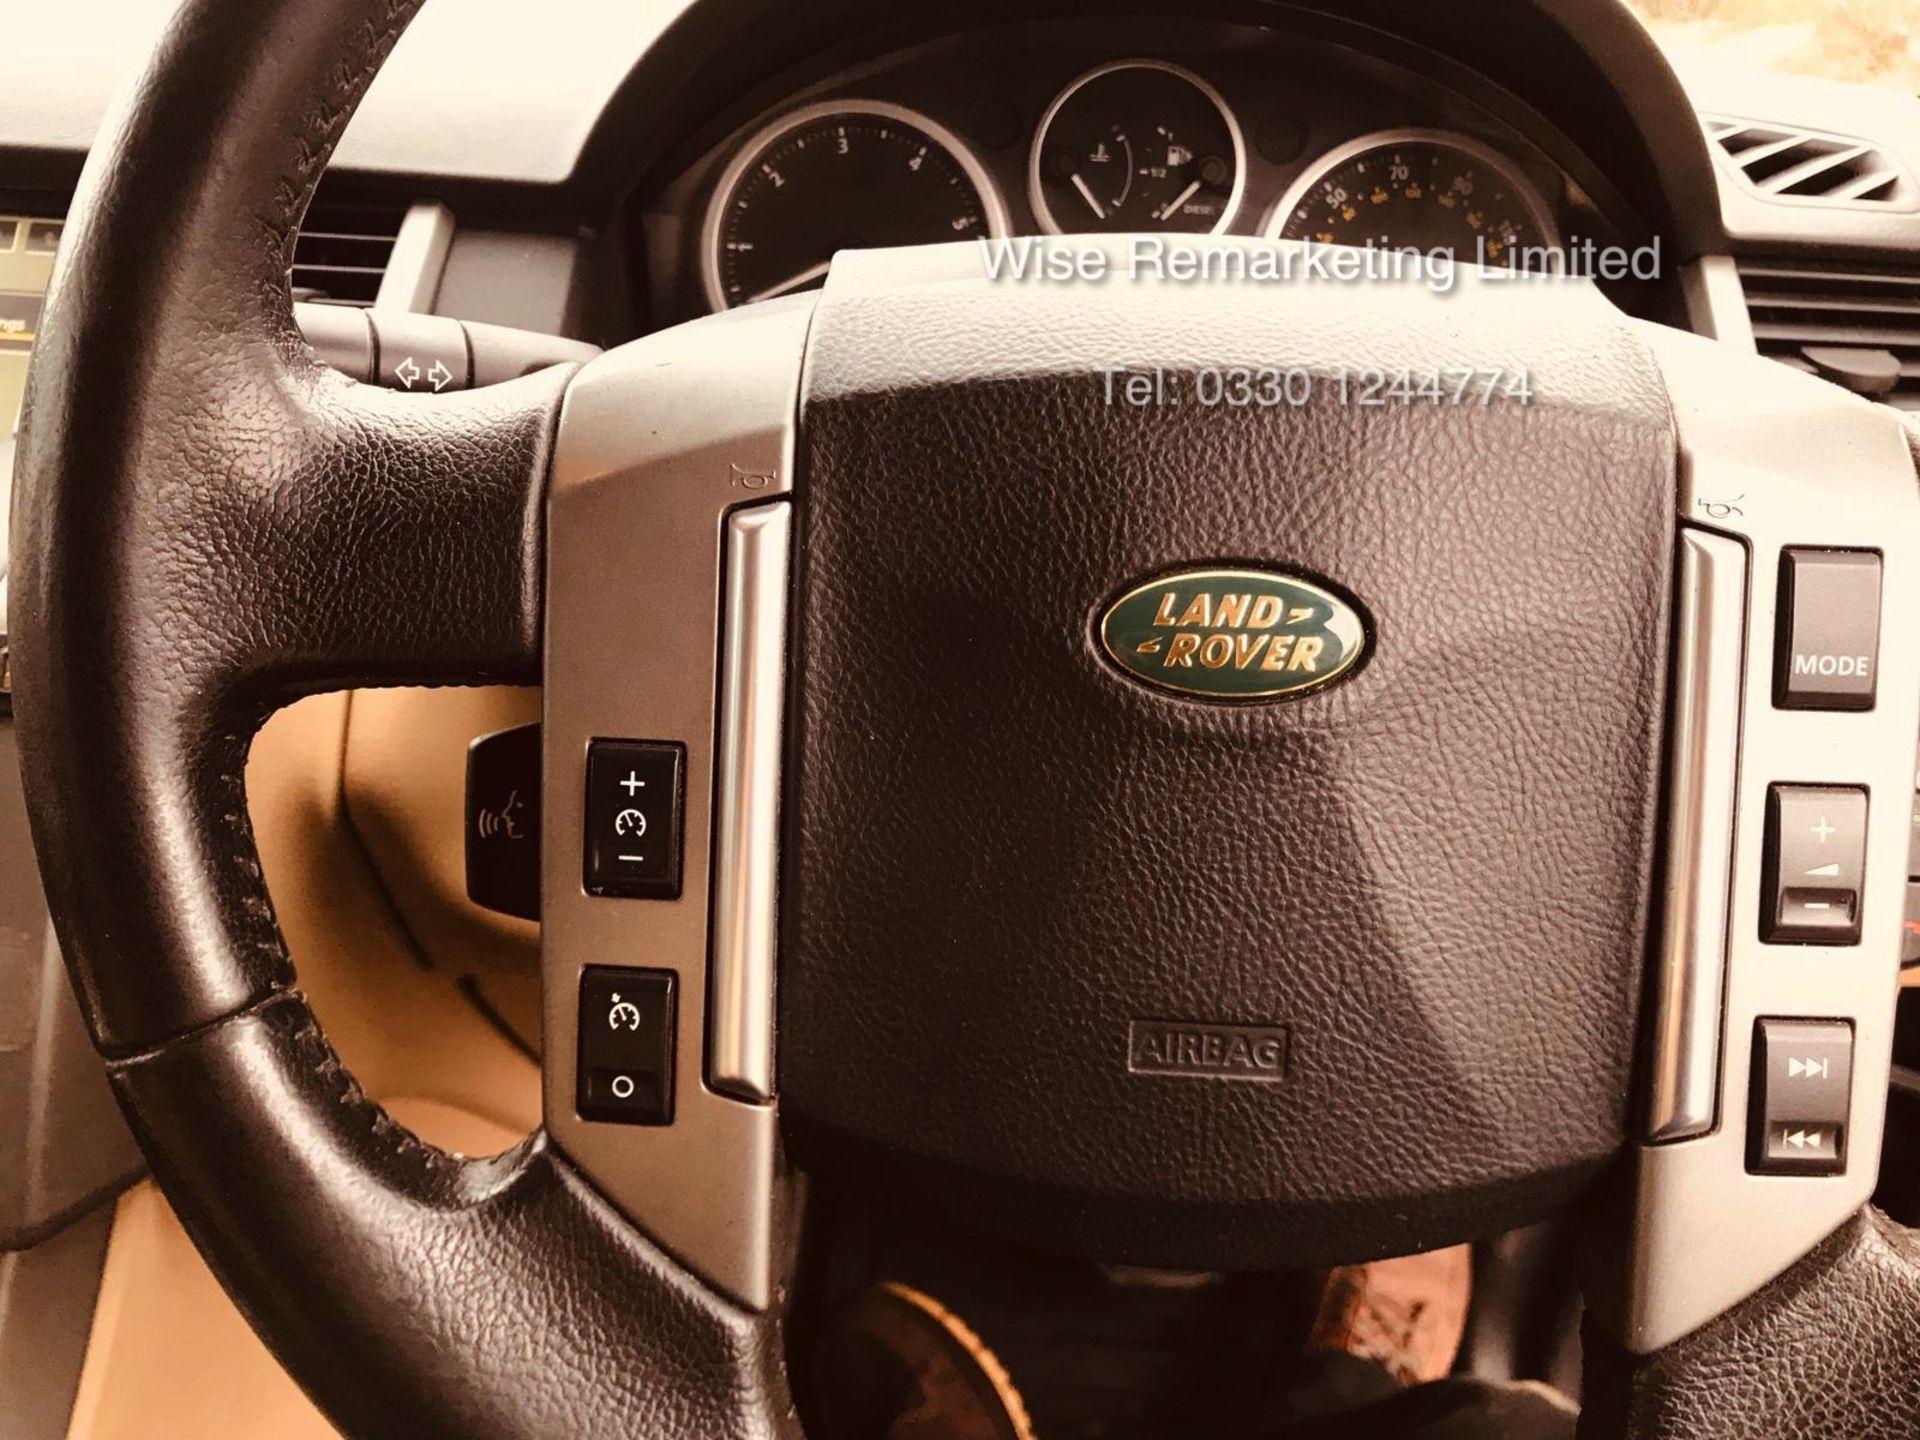 Range Rover Sport 2.7 TDV6 HSE Auto - 2008 Model - Cream Leather - Sat Nav - Heated Seats - Image 11 of 19